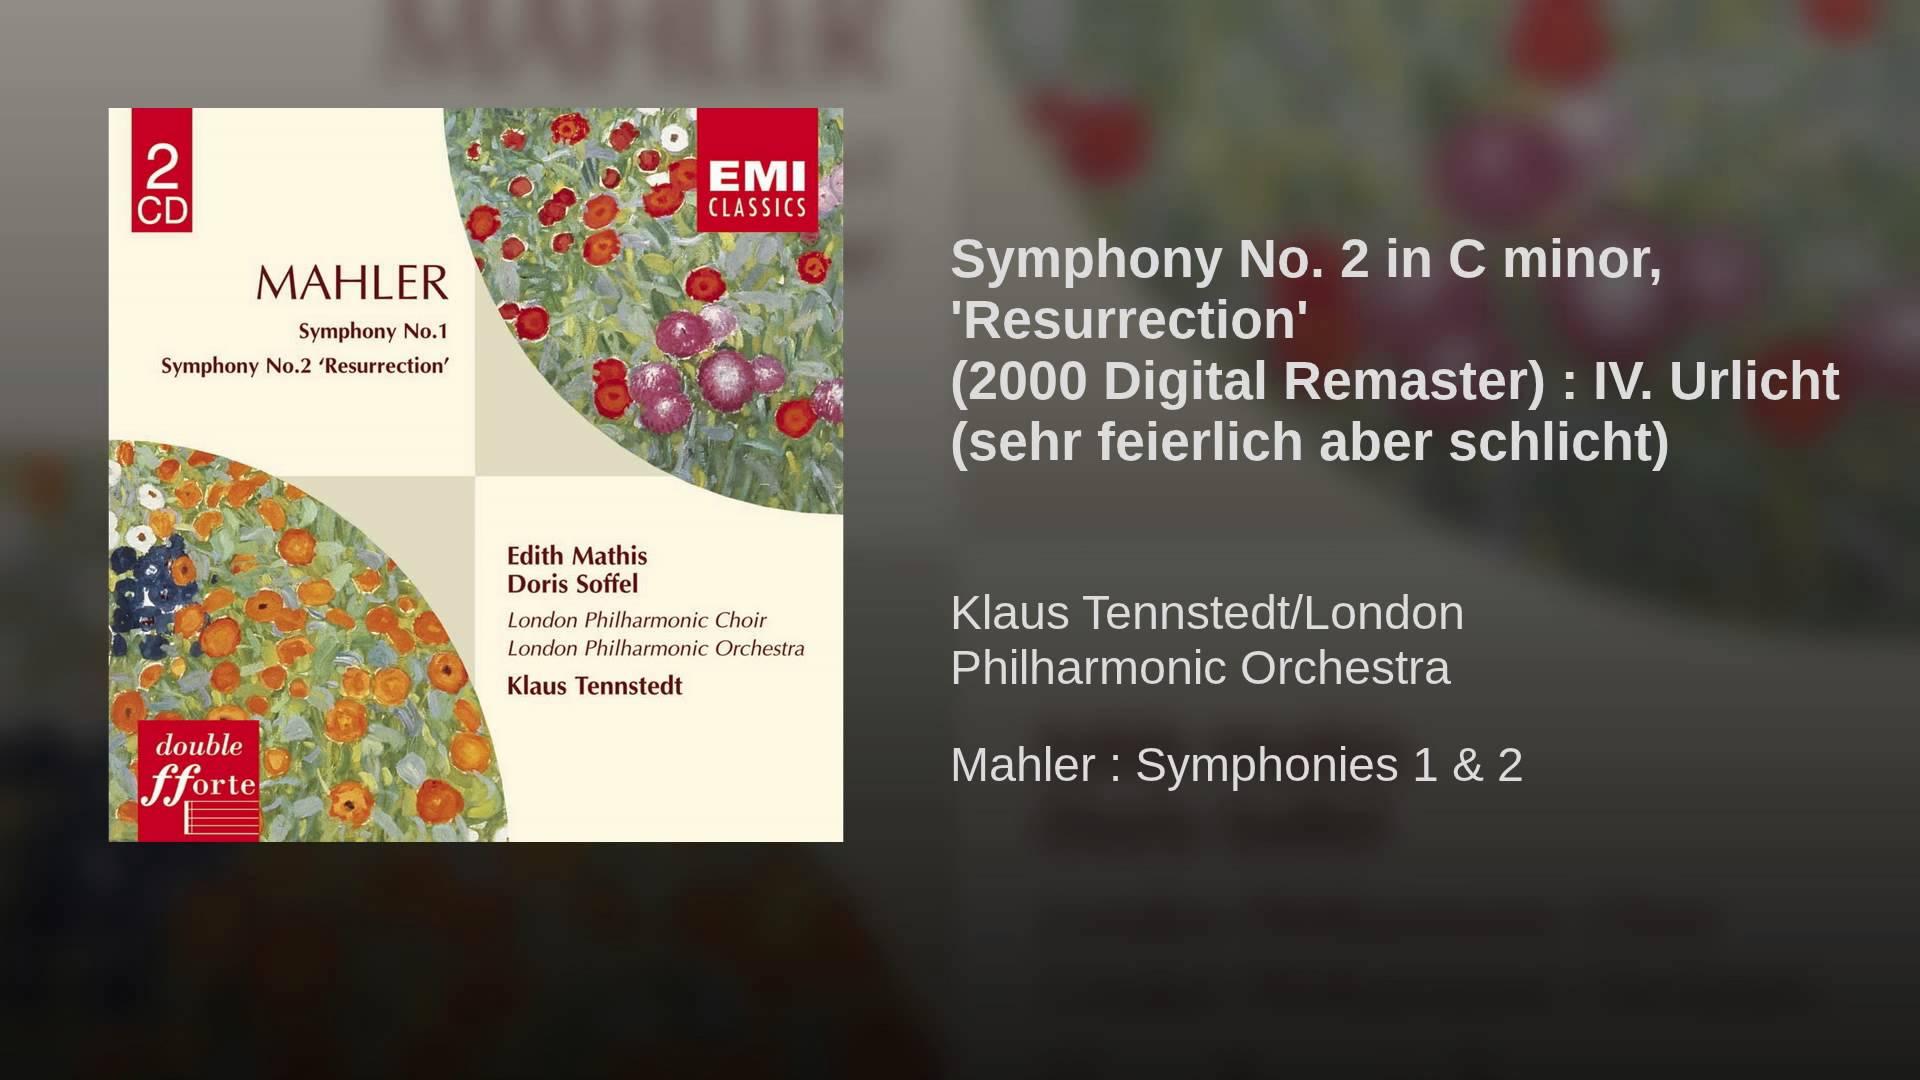 Mahler: Urlicht from Symphony No. 2